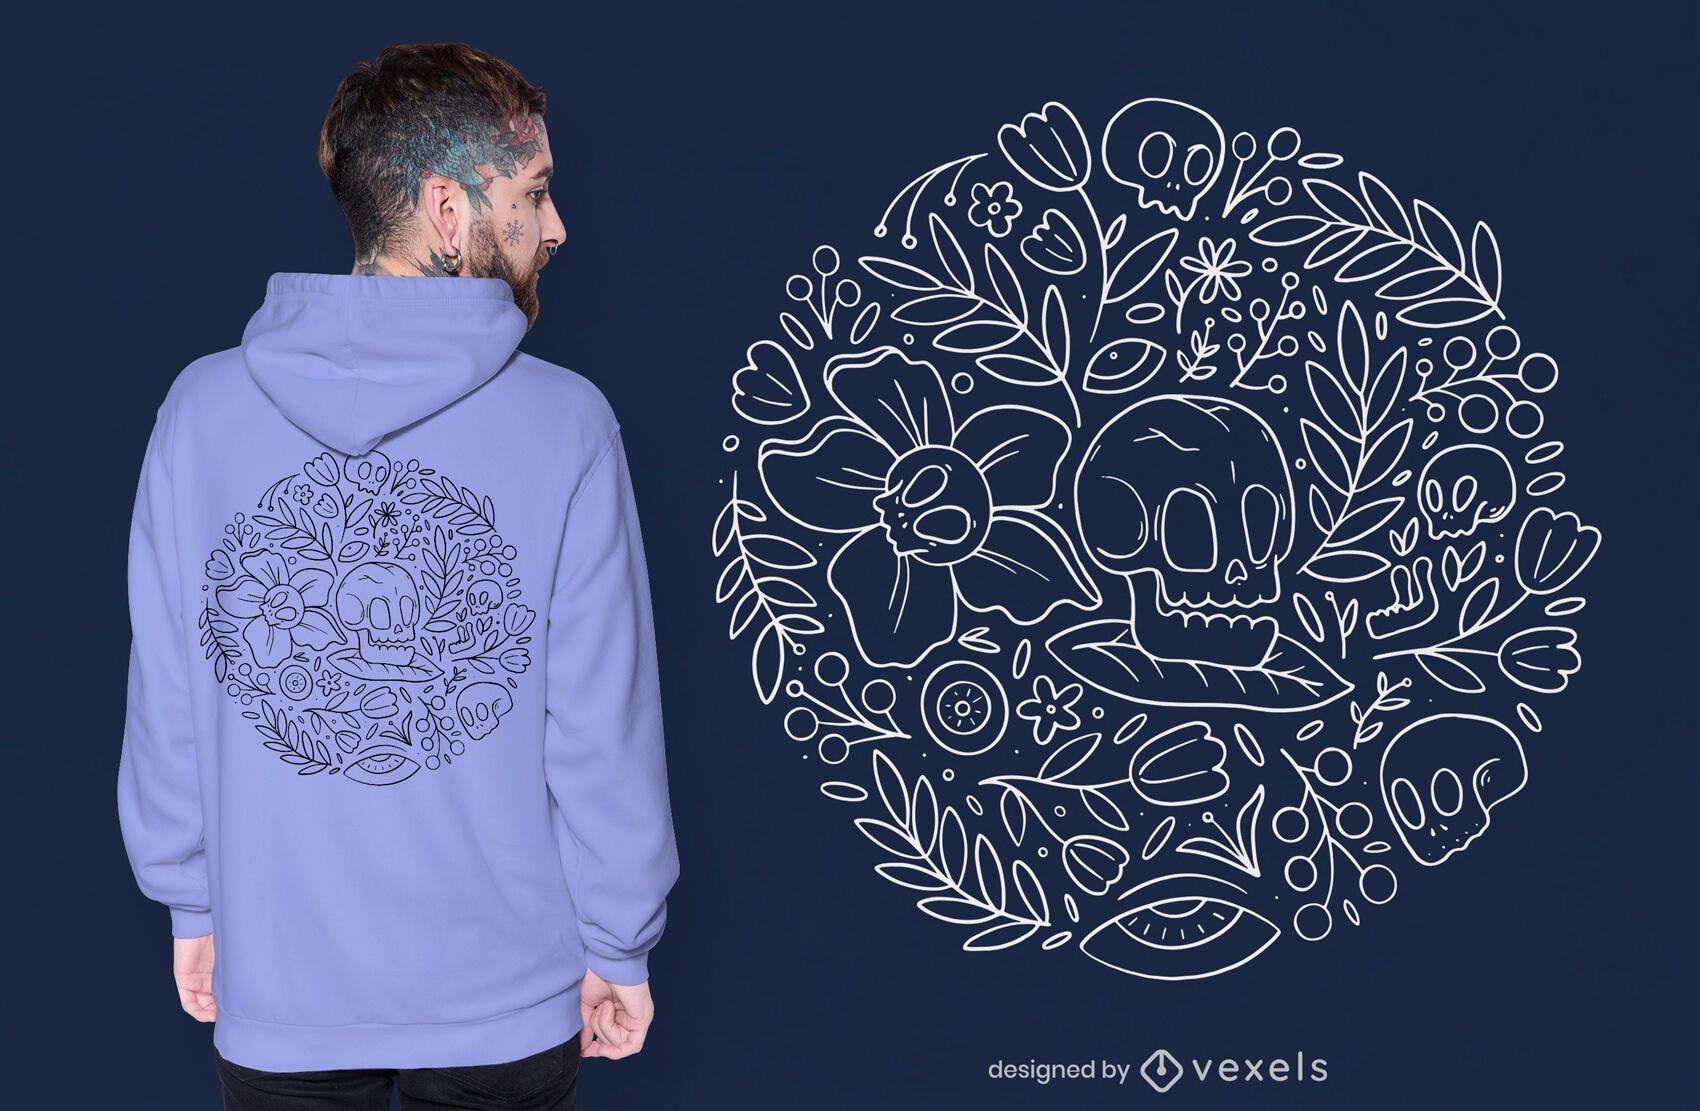 Skulls and flowers nature t-shirt design